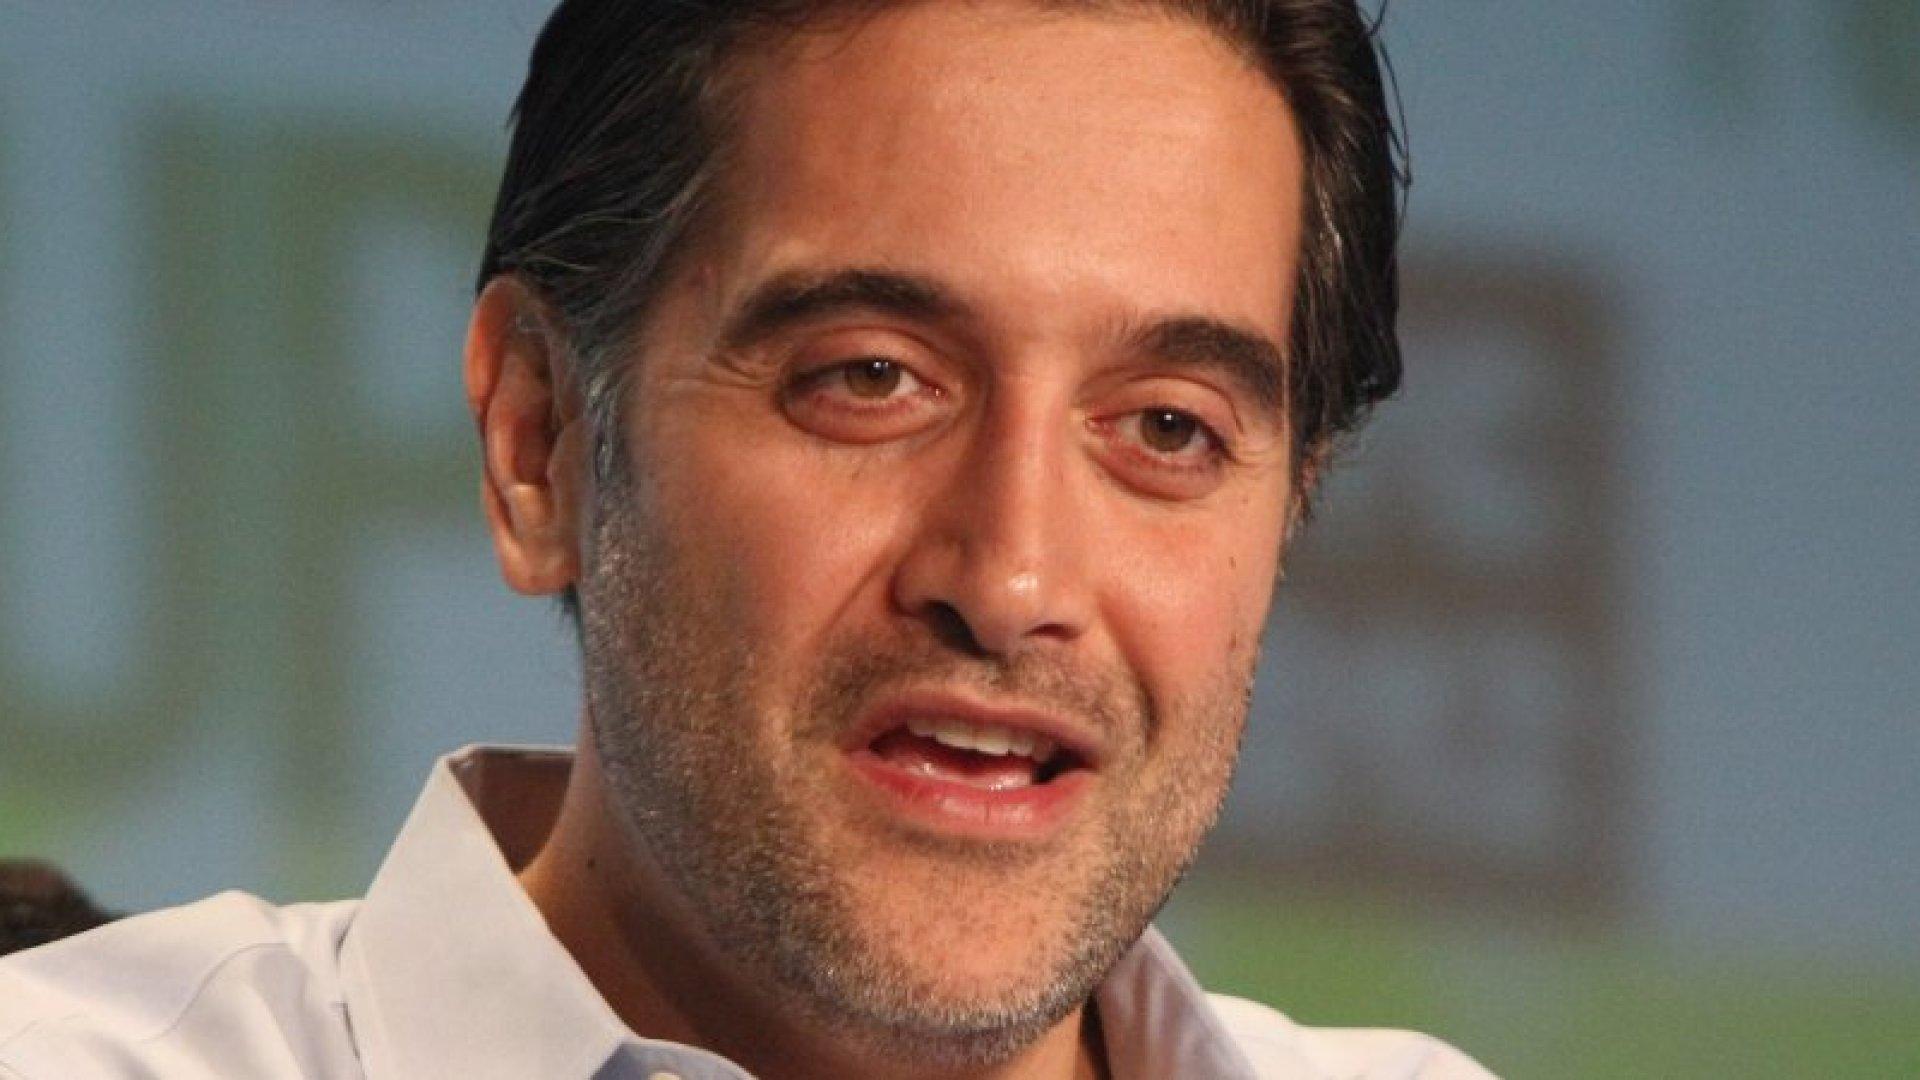 ZocDoc Co-Founder Cyrus Massoumi on Letting Your Ideas Evolve